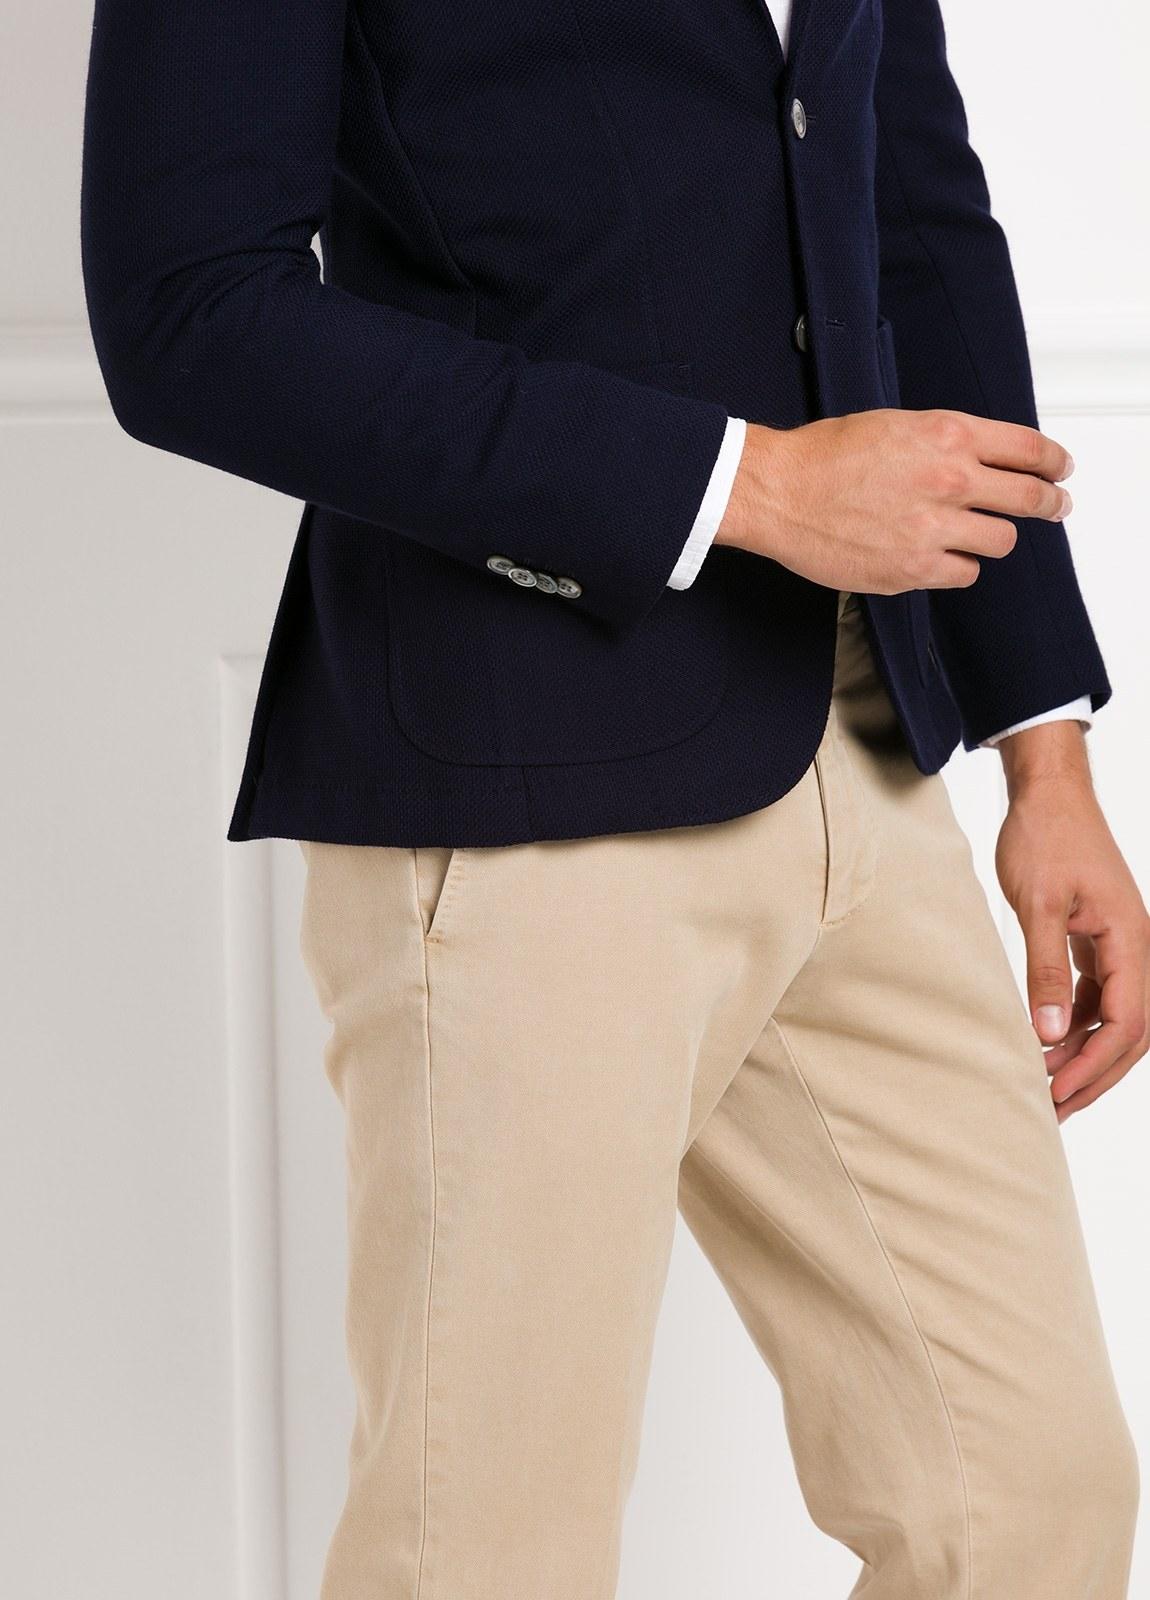 Americana SOFT JACKET Slim Fit textura color azul marino, 100% Lana fria. - Ítem1